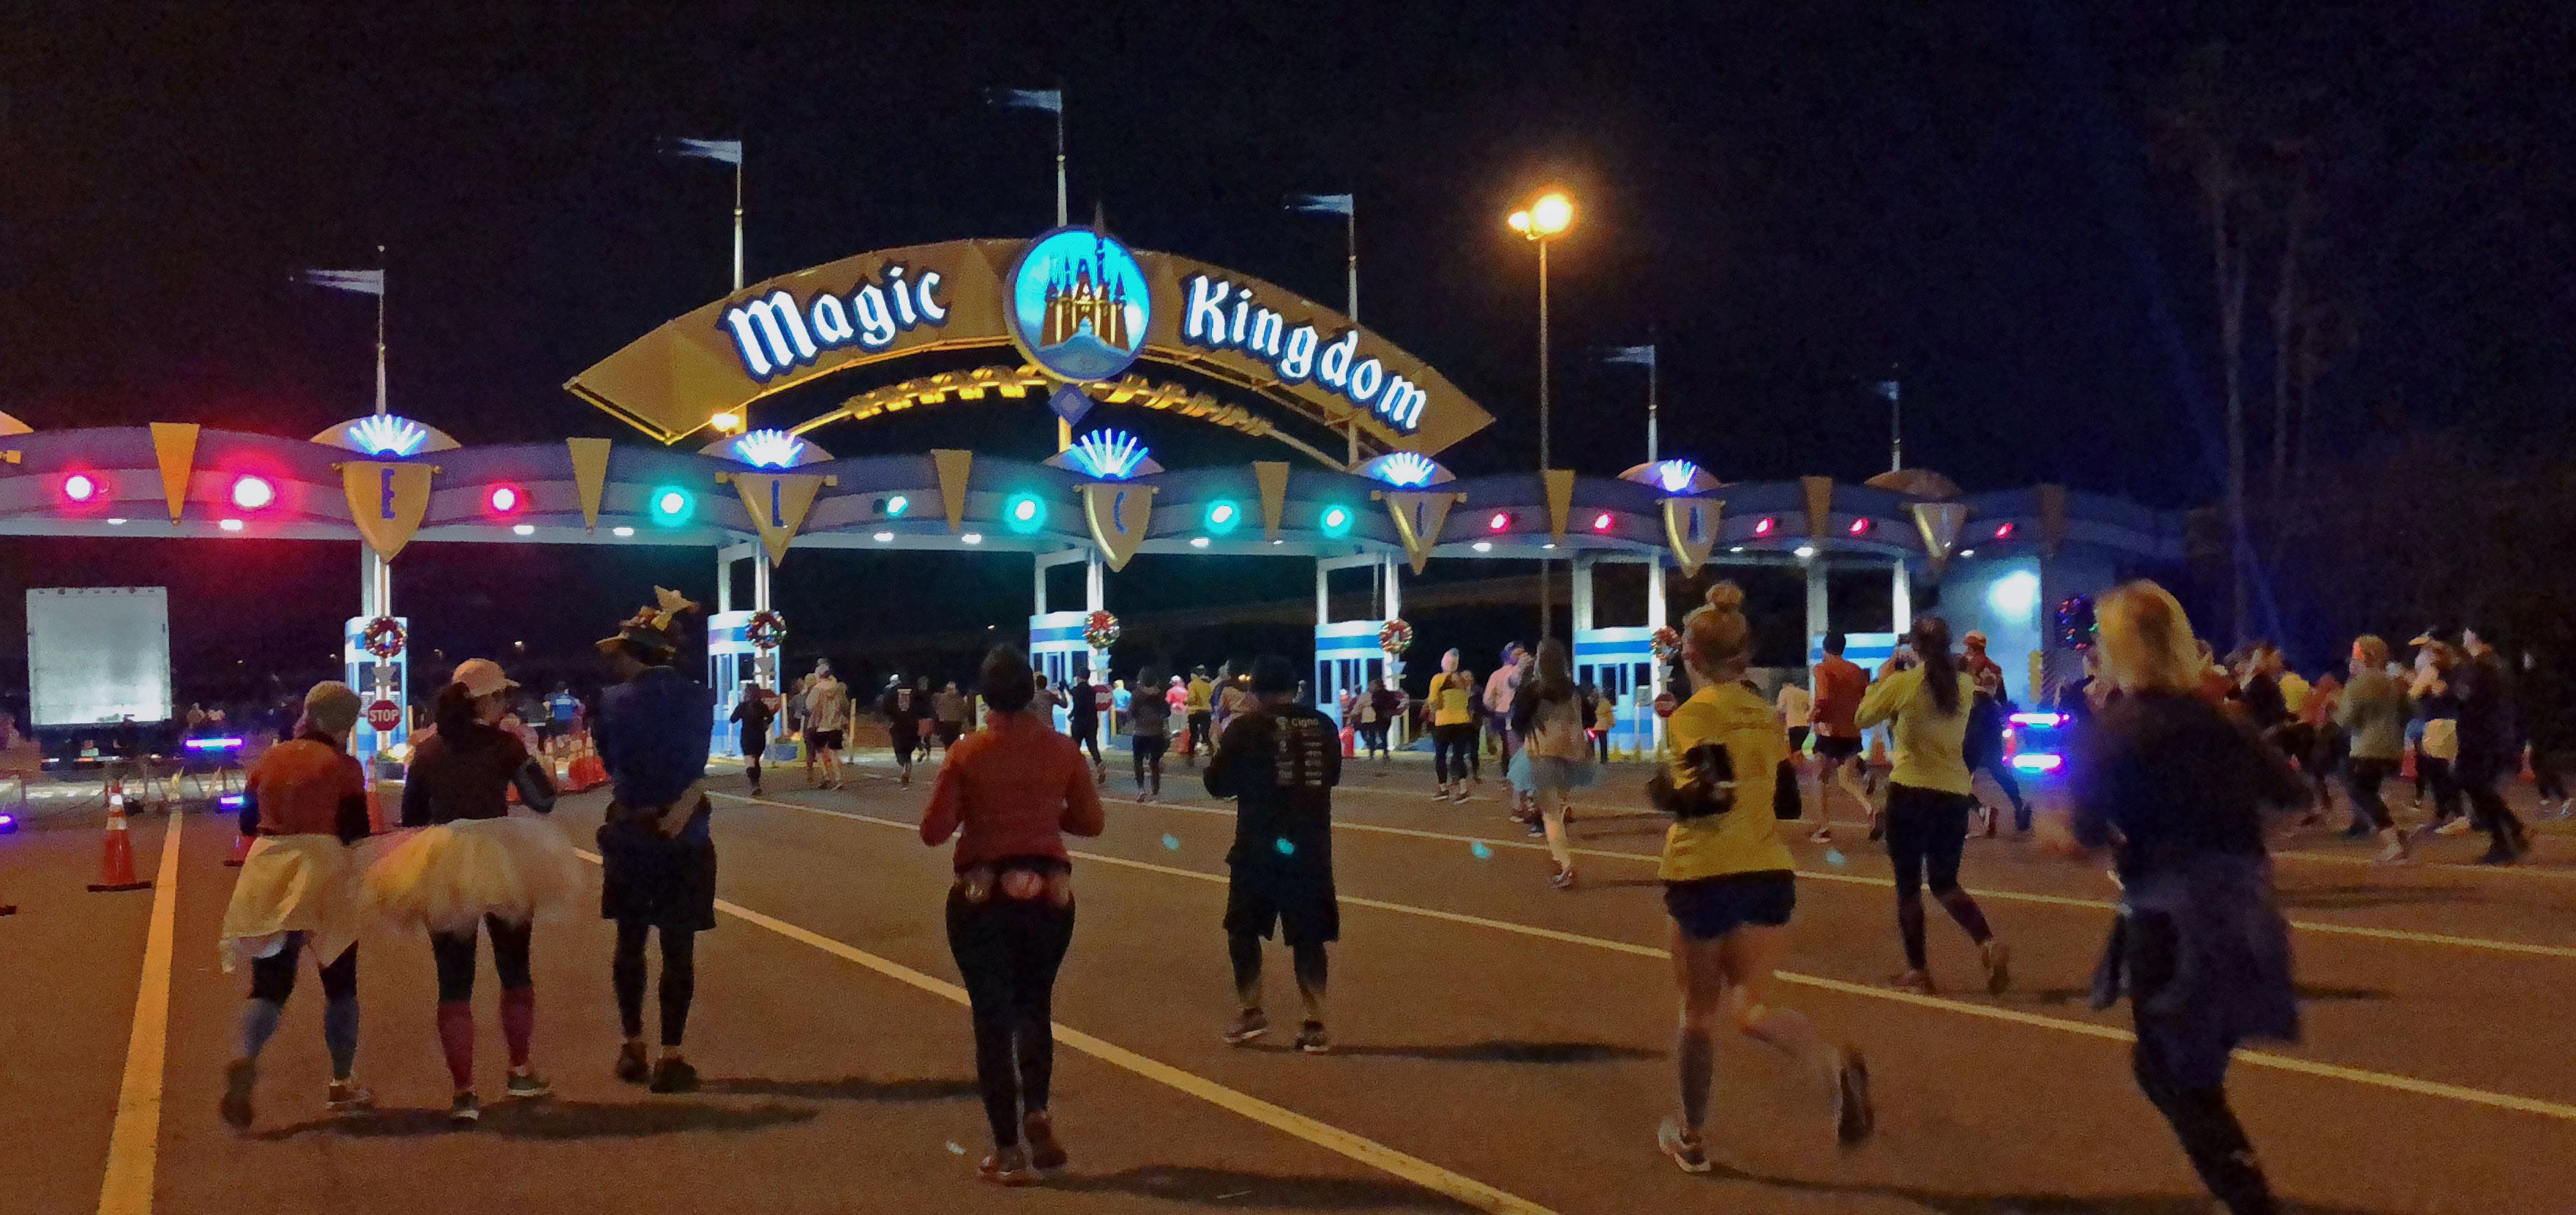 Os eventos de corrida Disney, runDisney